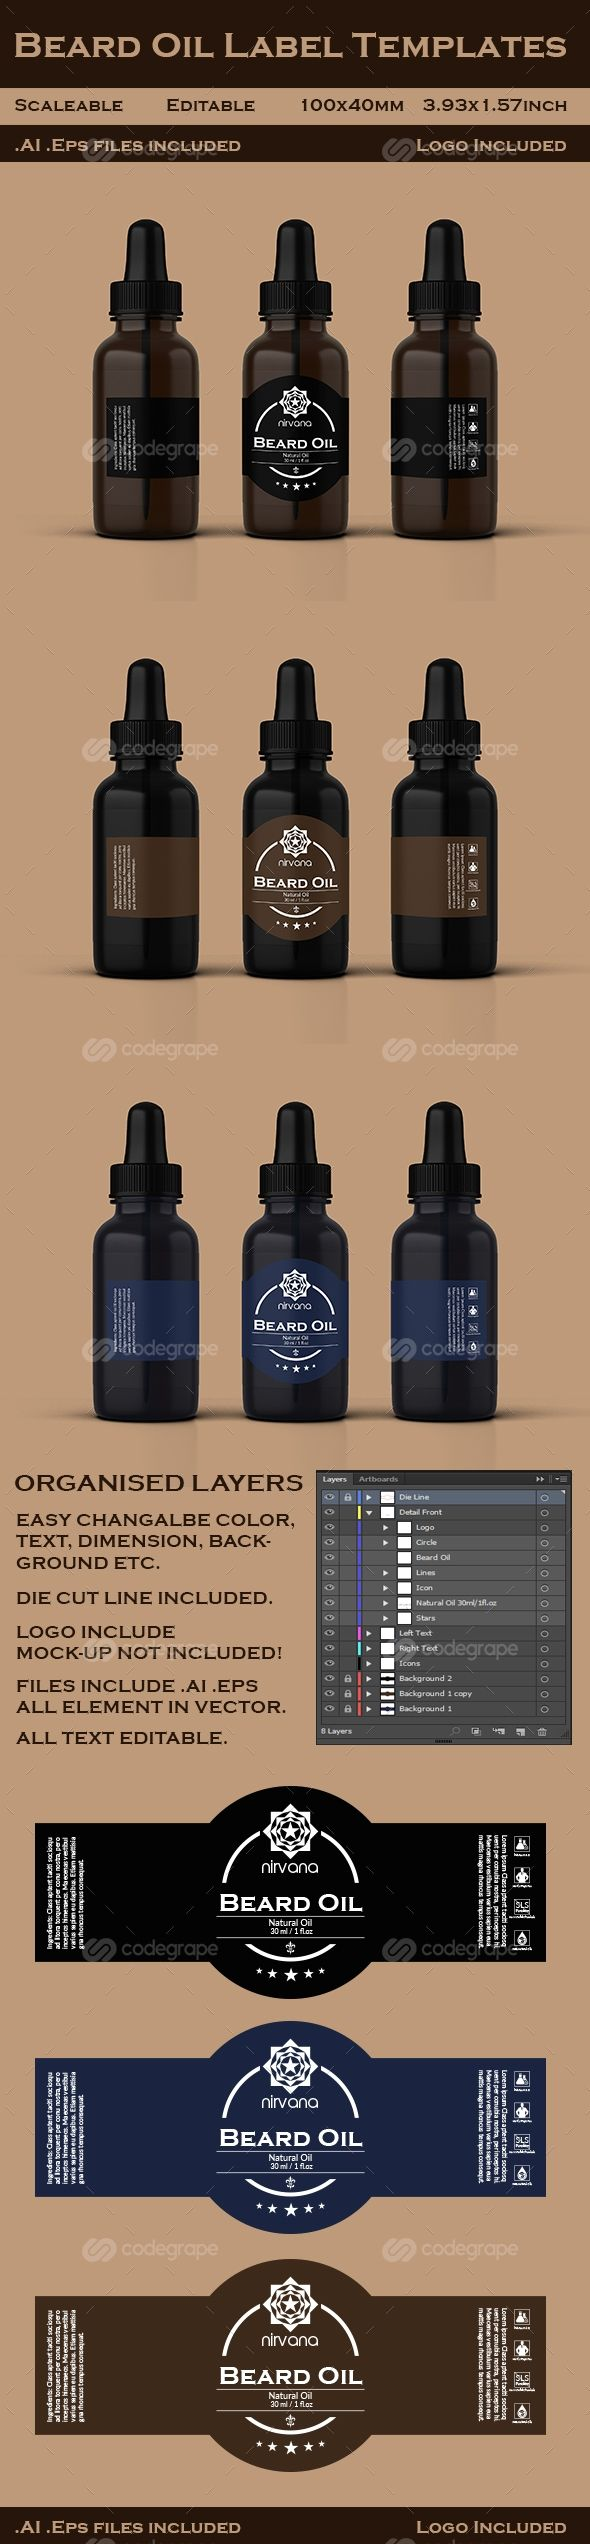 Beard Oil Label Templates on @codegrape. More Info: https://www.codegrape.com/item/beard-oil-label-templates/10628